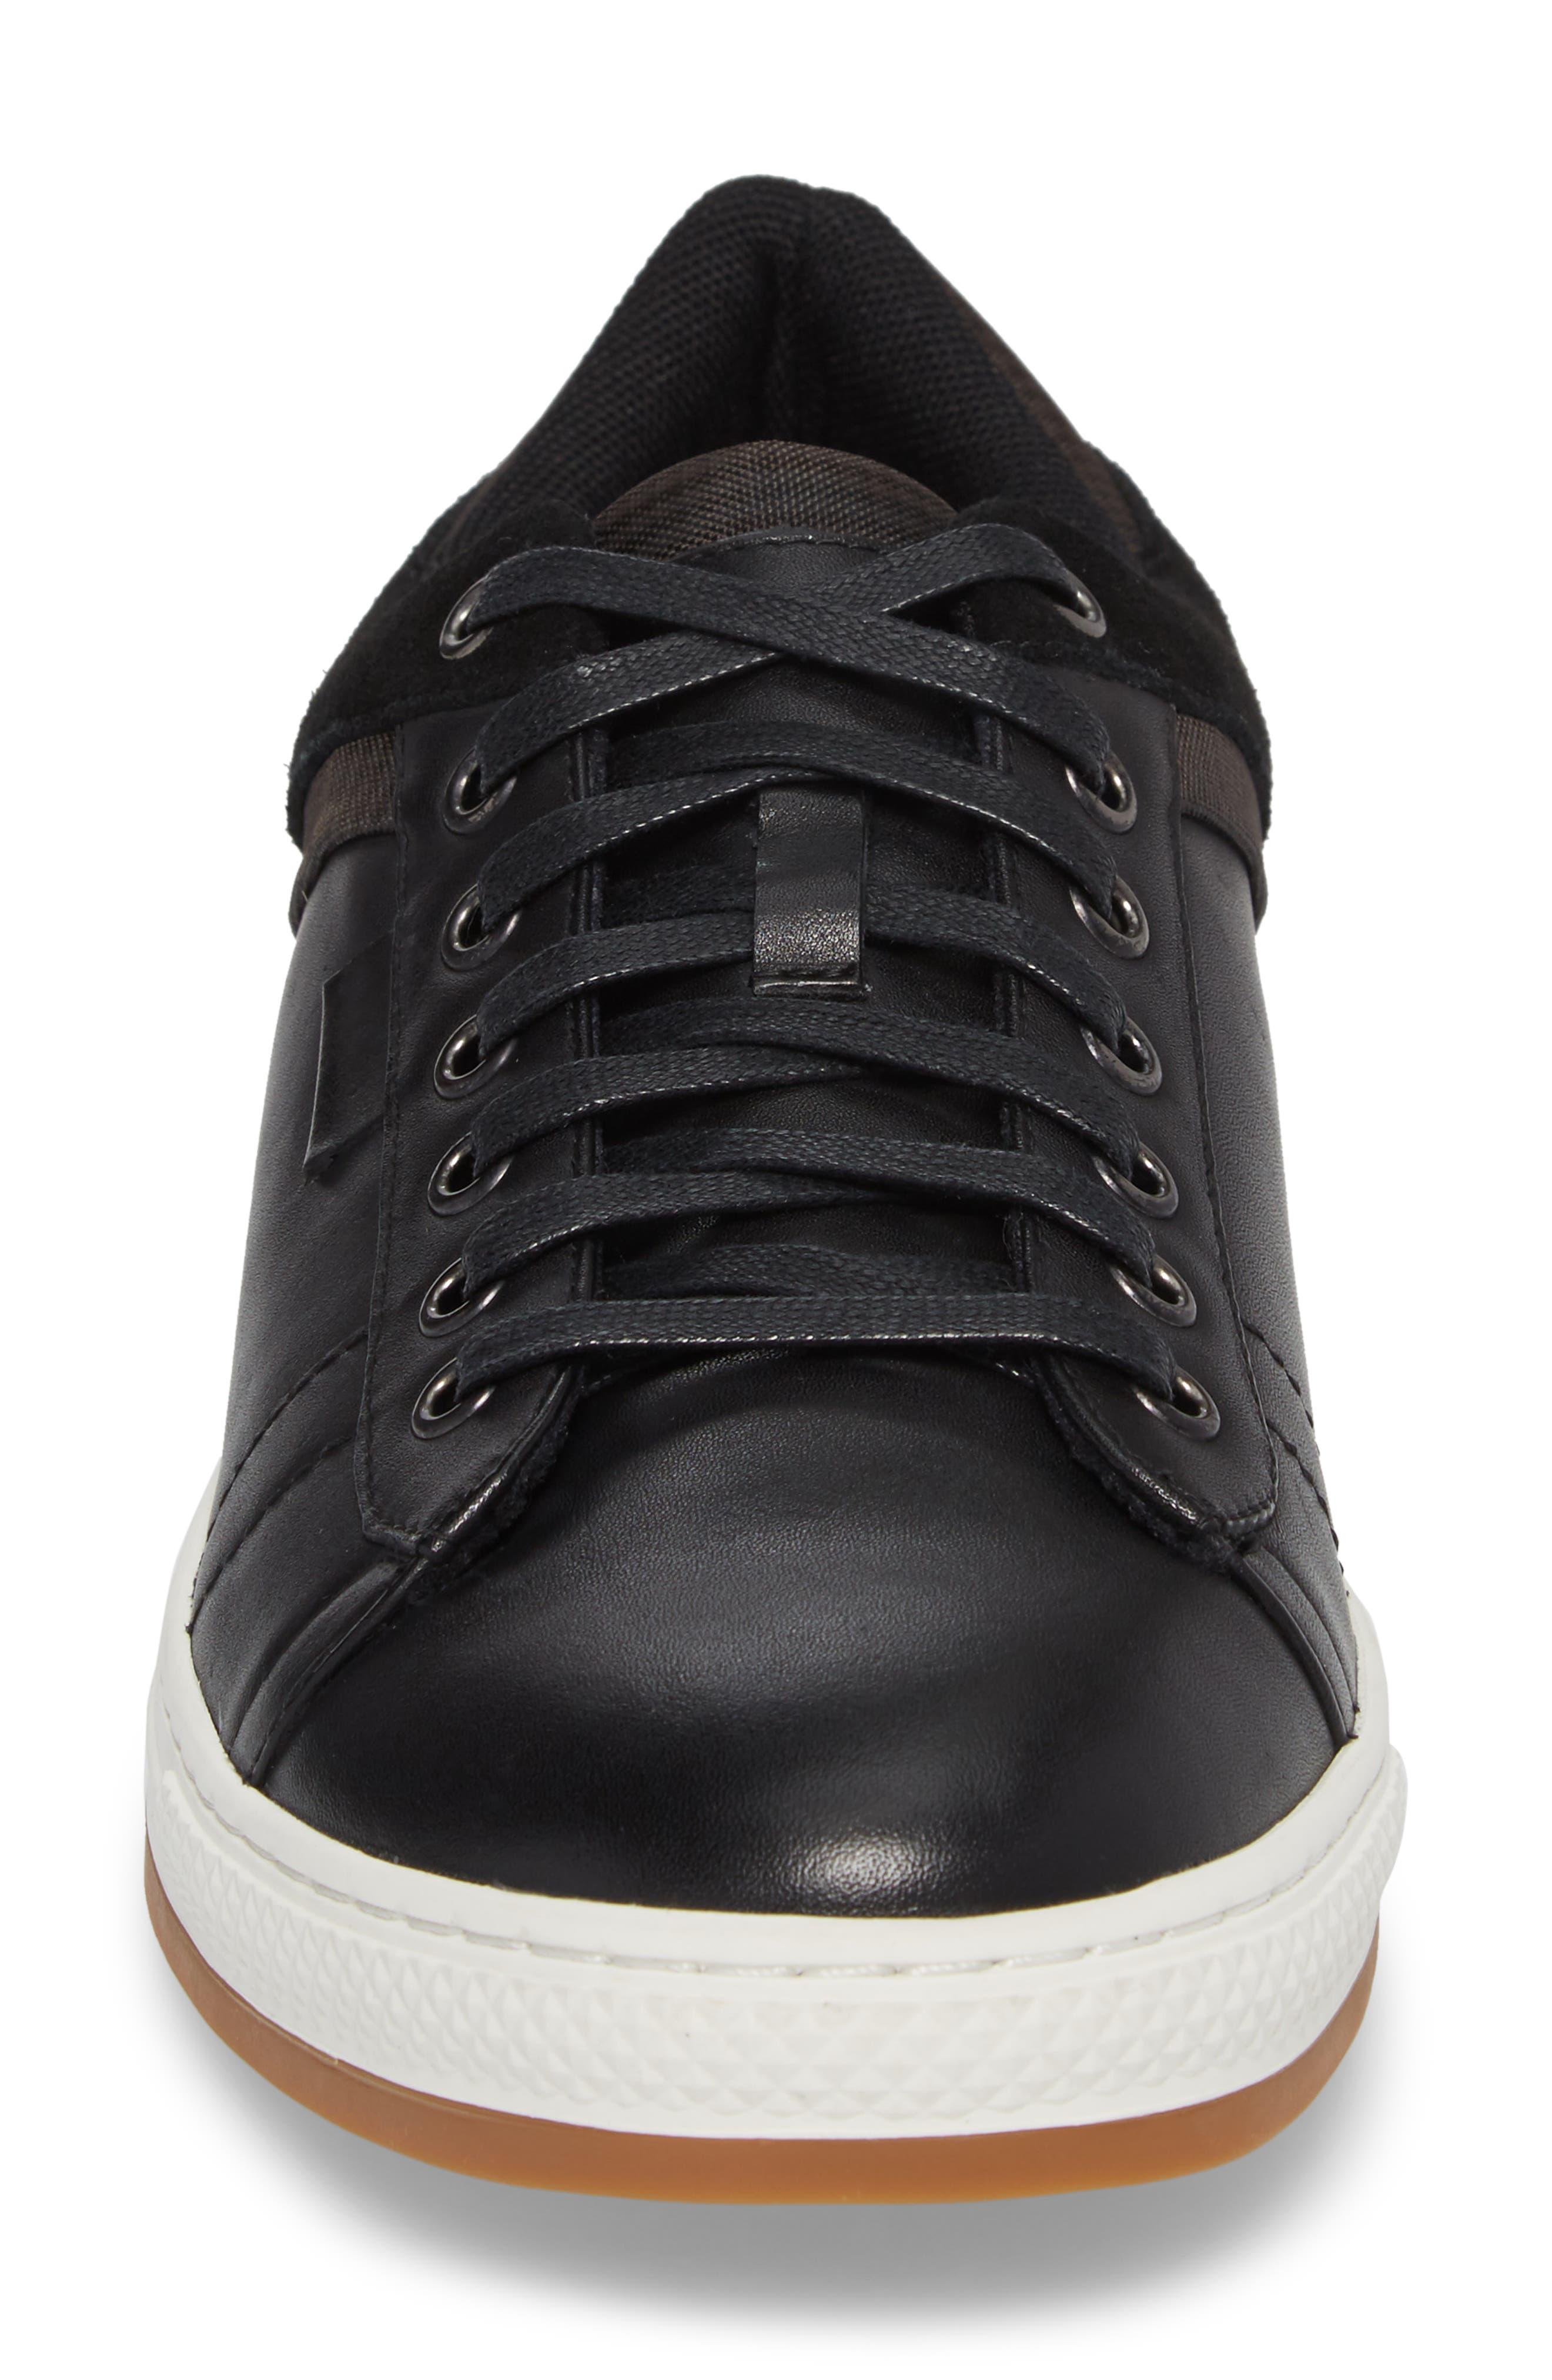 Ireton Low Top Sneaker,                             Alternate thumbnail 4, color,                             BLACK LEATHER/ SUEDE